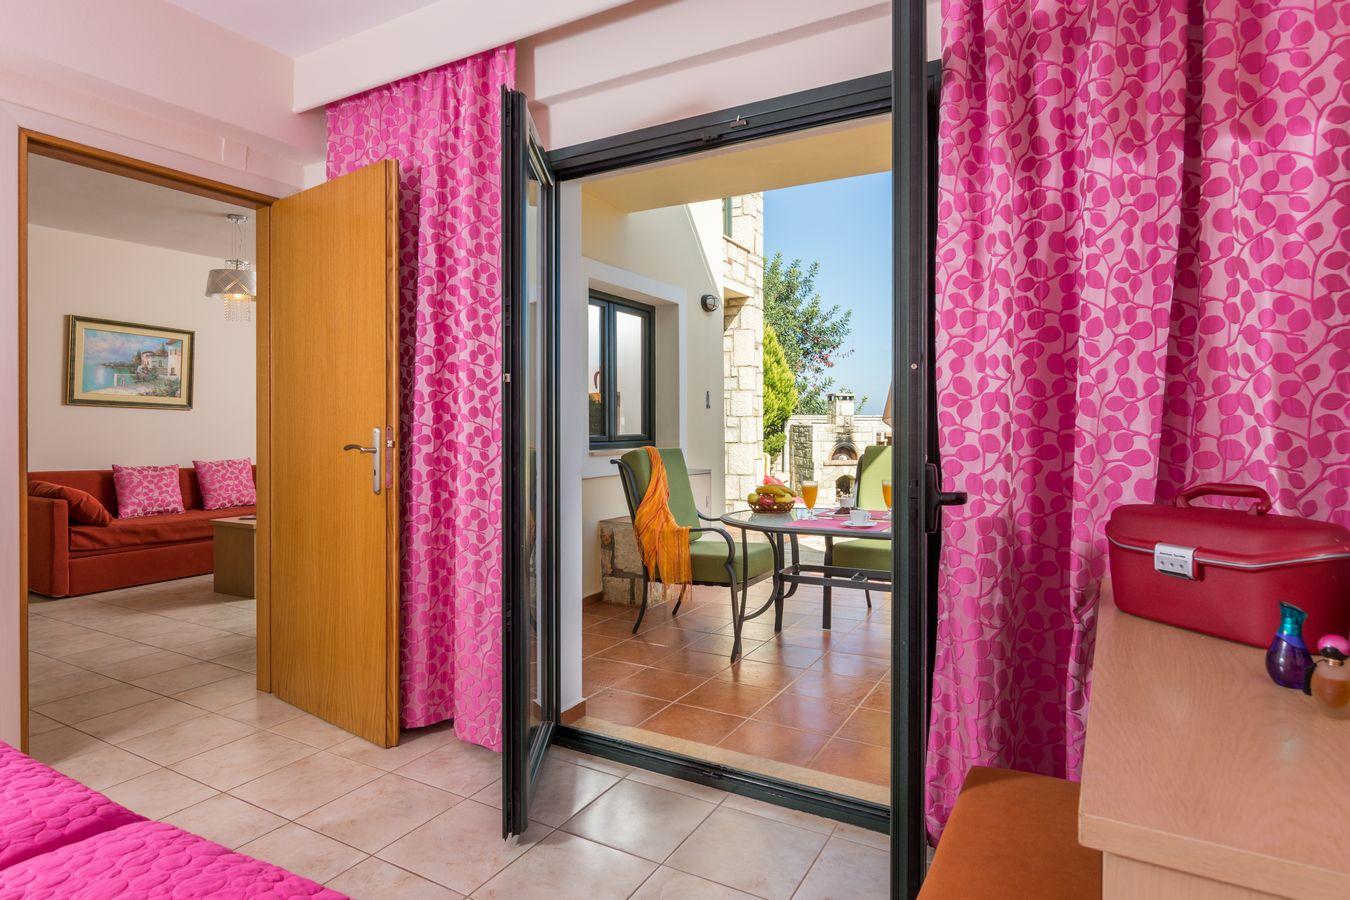 Garden Suite overview - Pilots Villas Hersonissos Crete